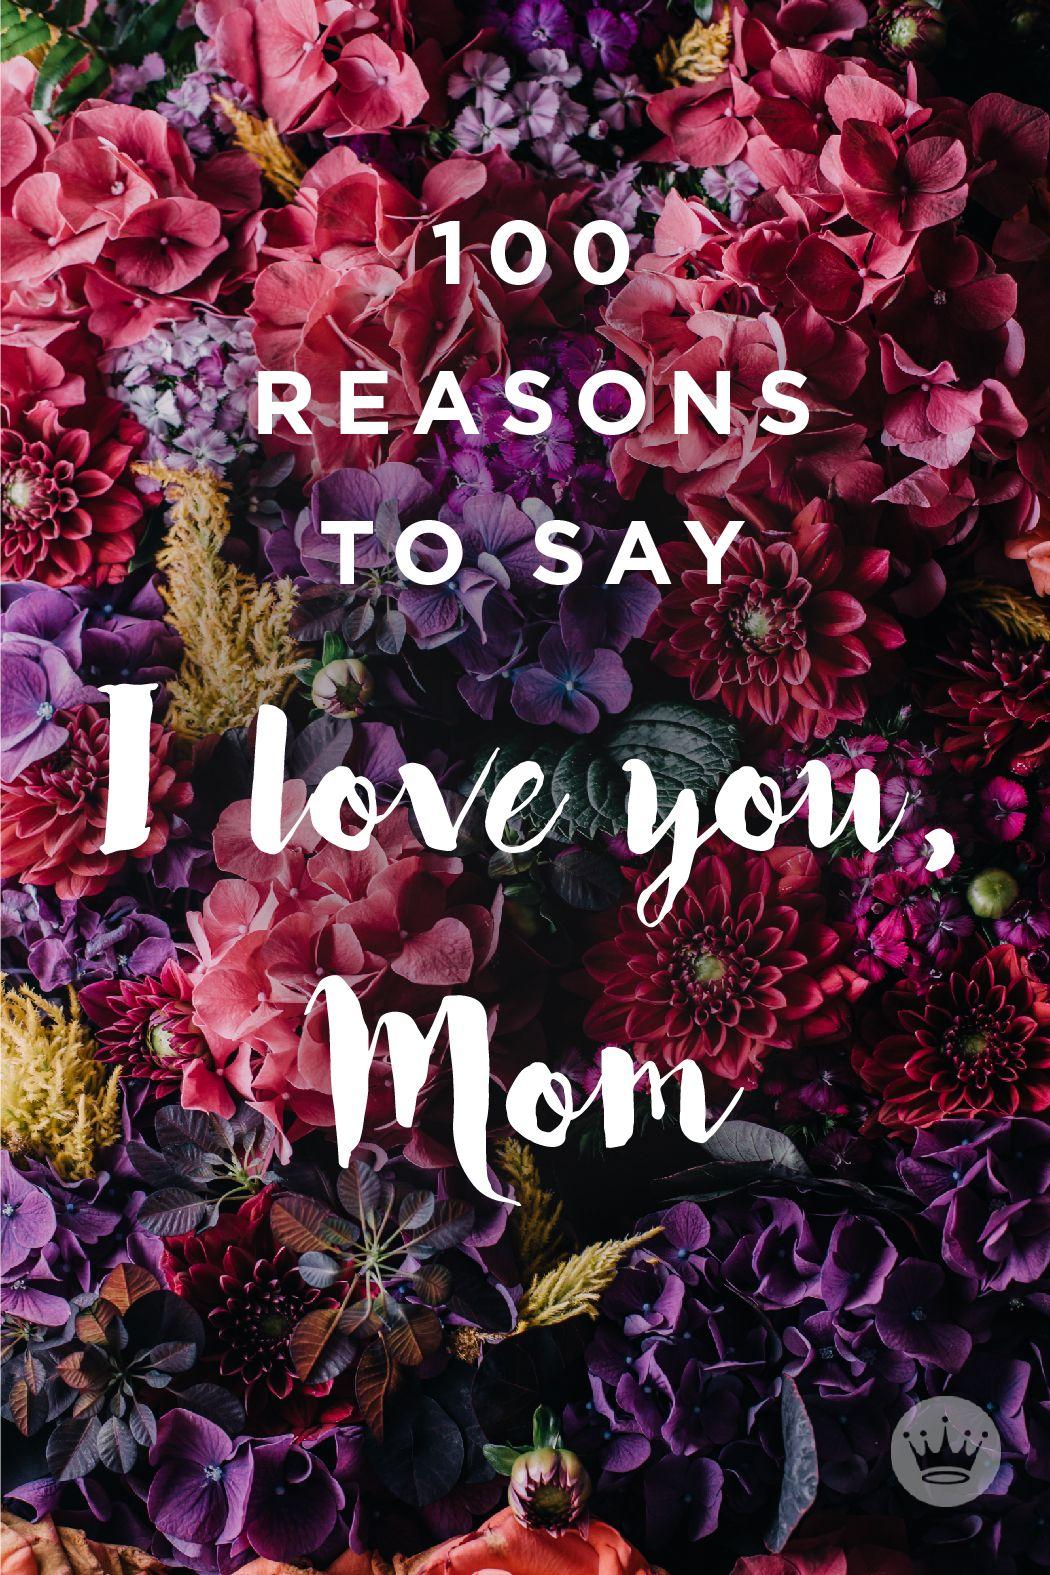 100 Reasons To Say I Love You Mom Love You Mom I Love Mom Birthday Message For Mom